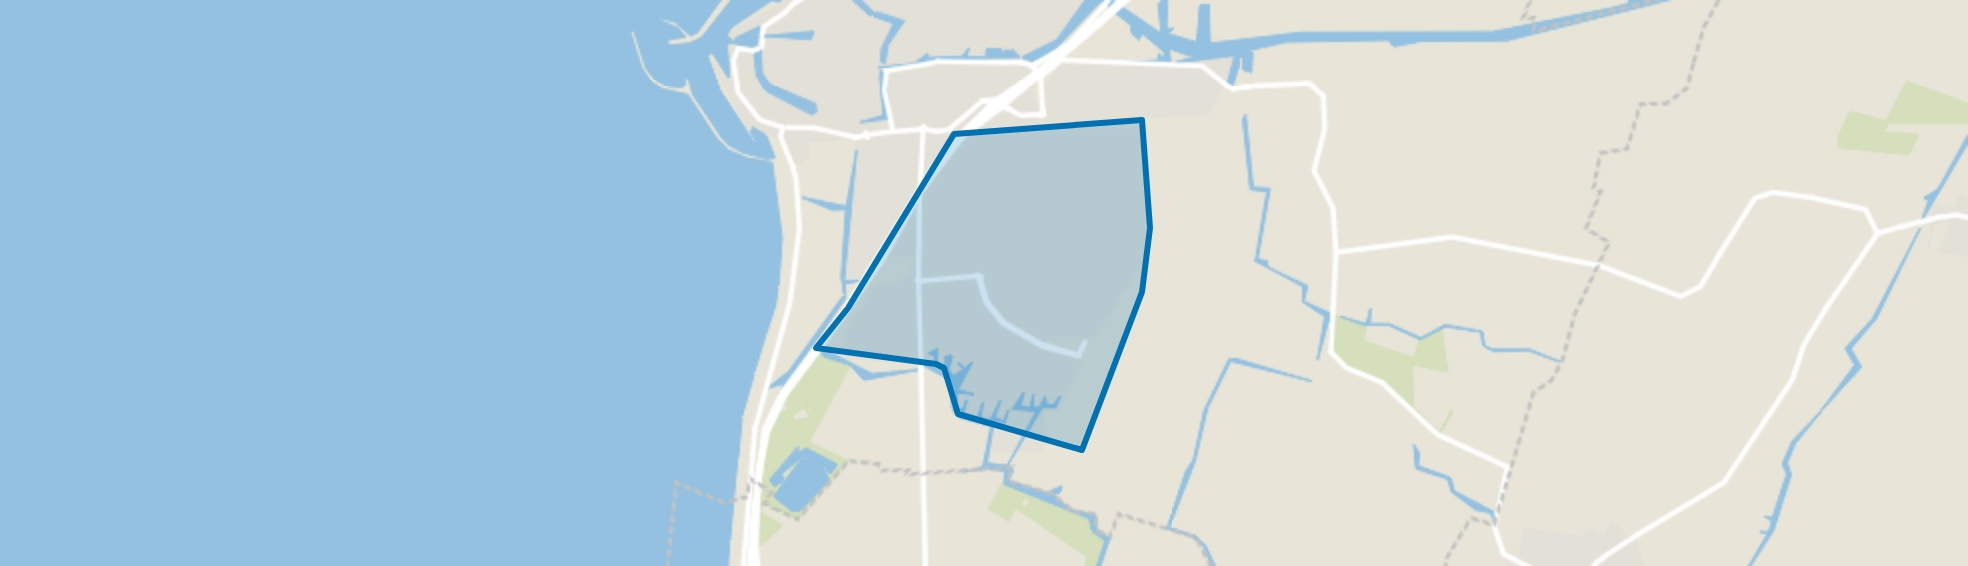 Oosterpark, Harlingen map